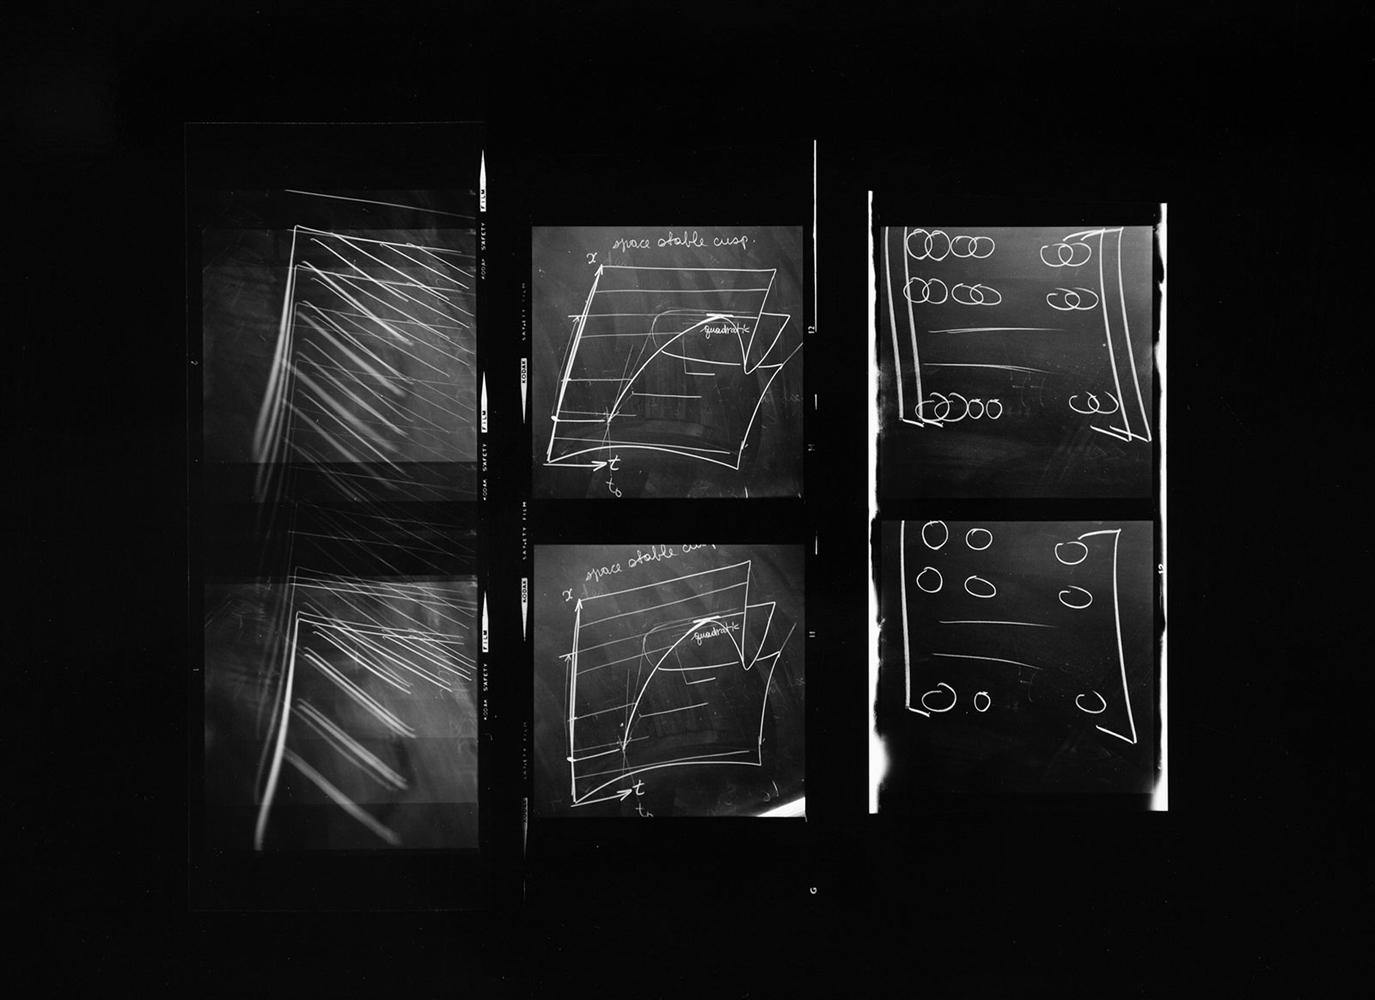 Paul Berger, Mathematics #39, 1976-77, gelatin silver print